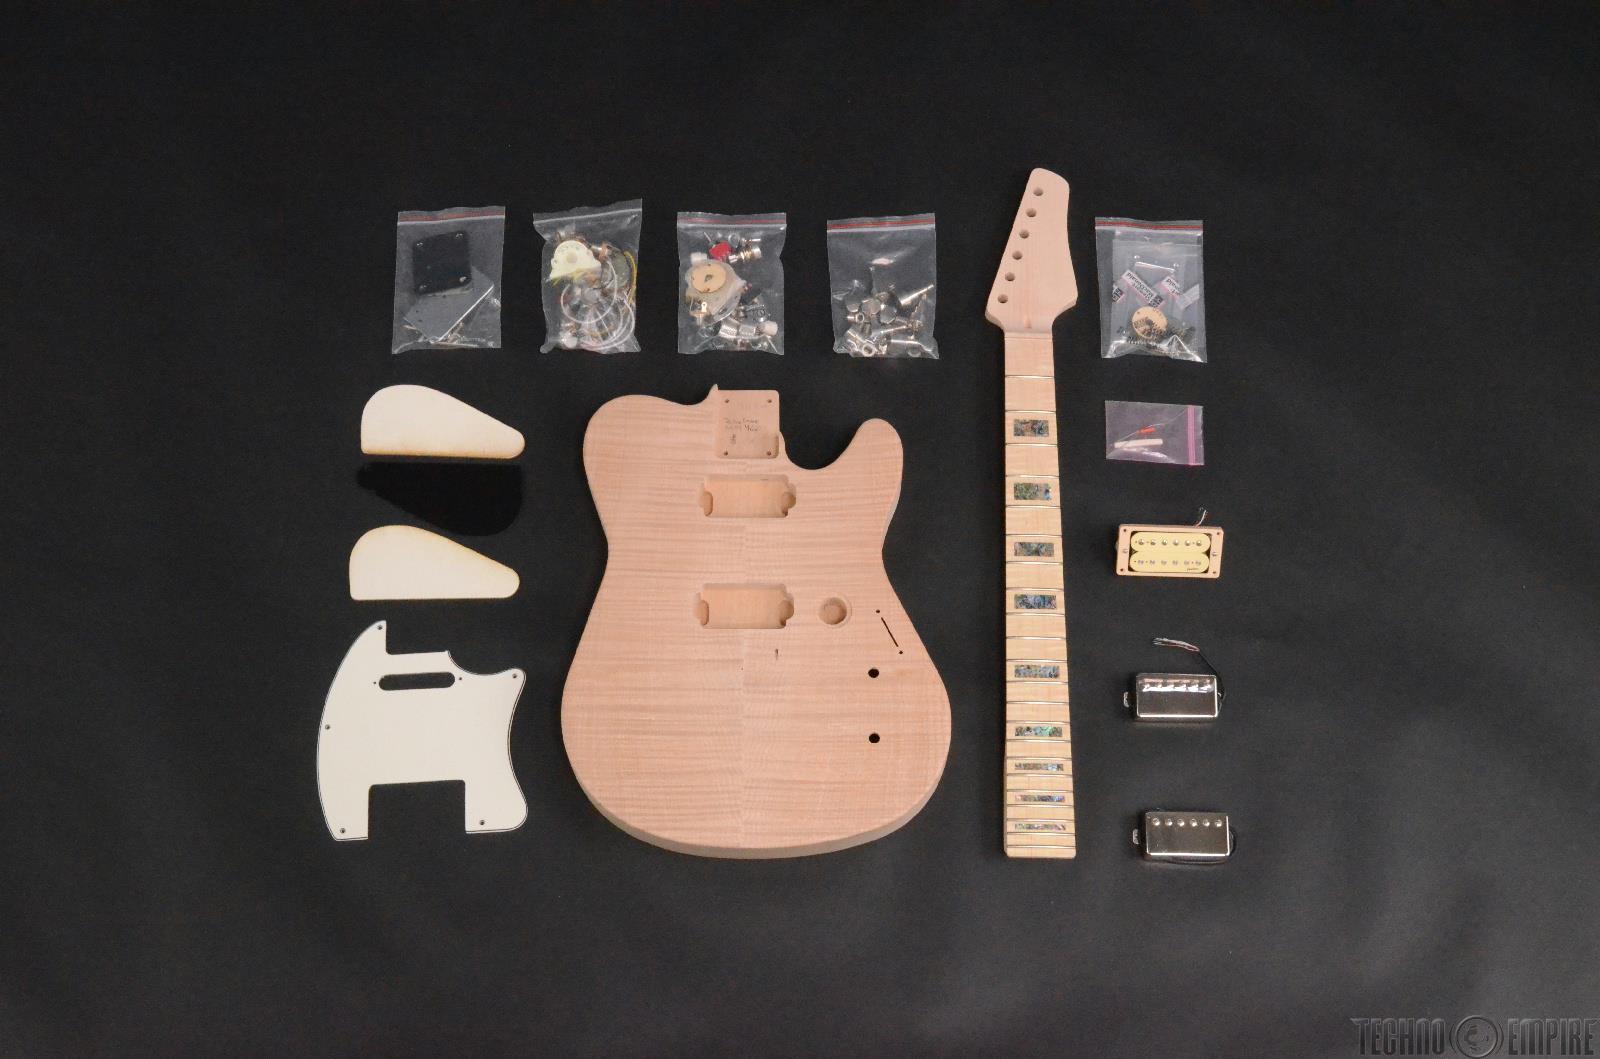 Buzz Feiten Gemini Signature Elite Build Your Own Electric Guitar Kit #28412